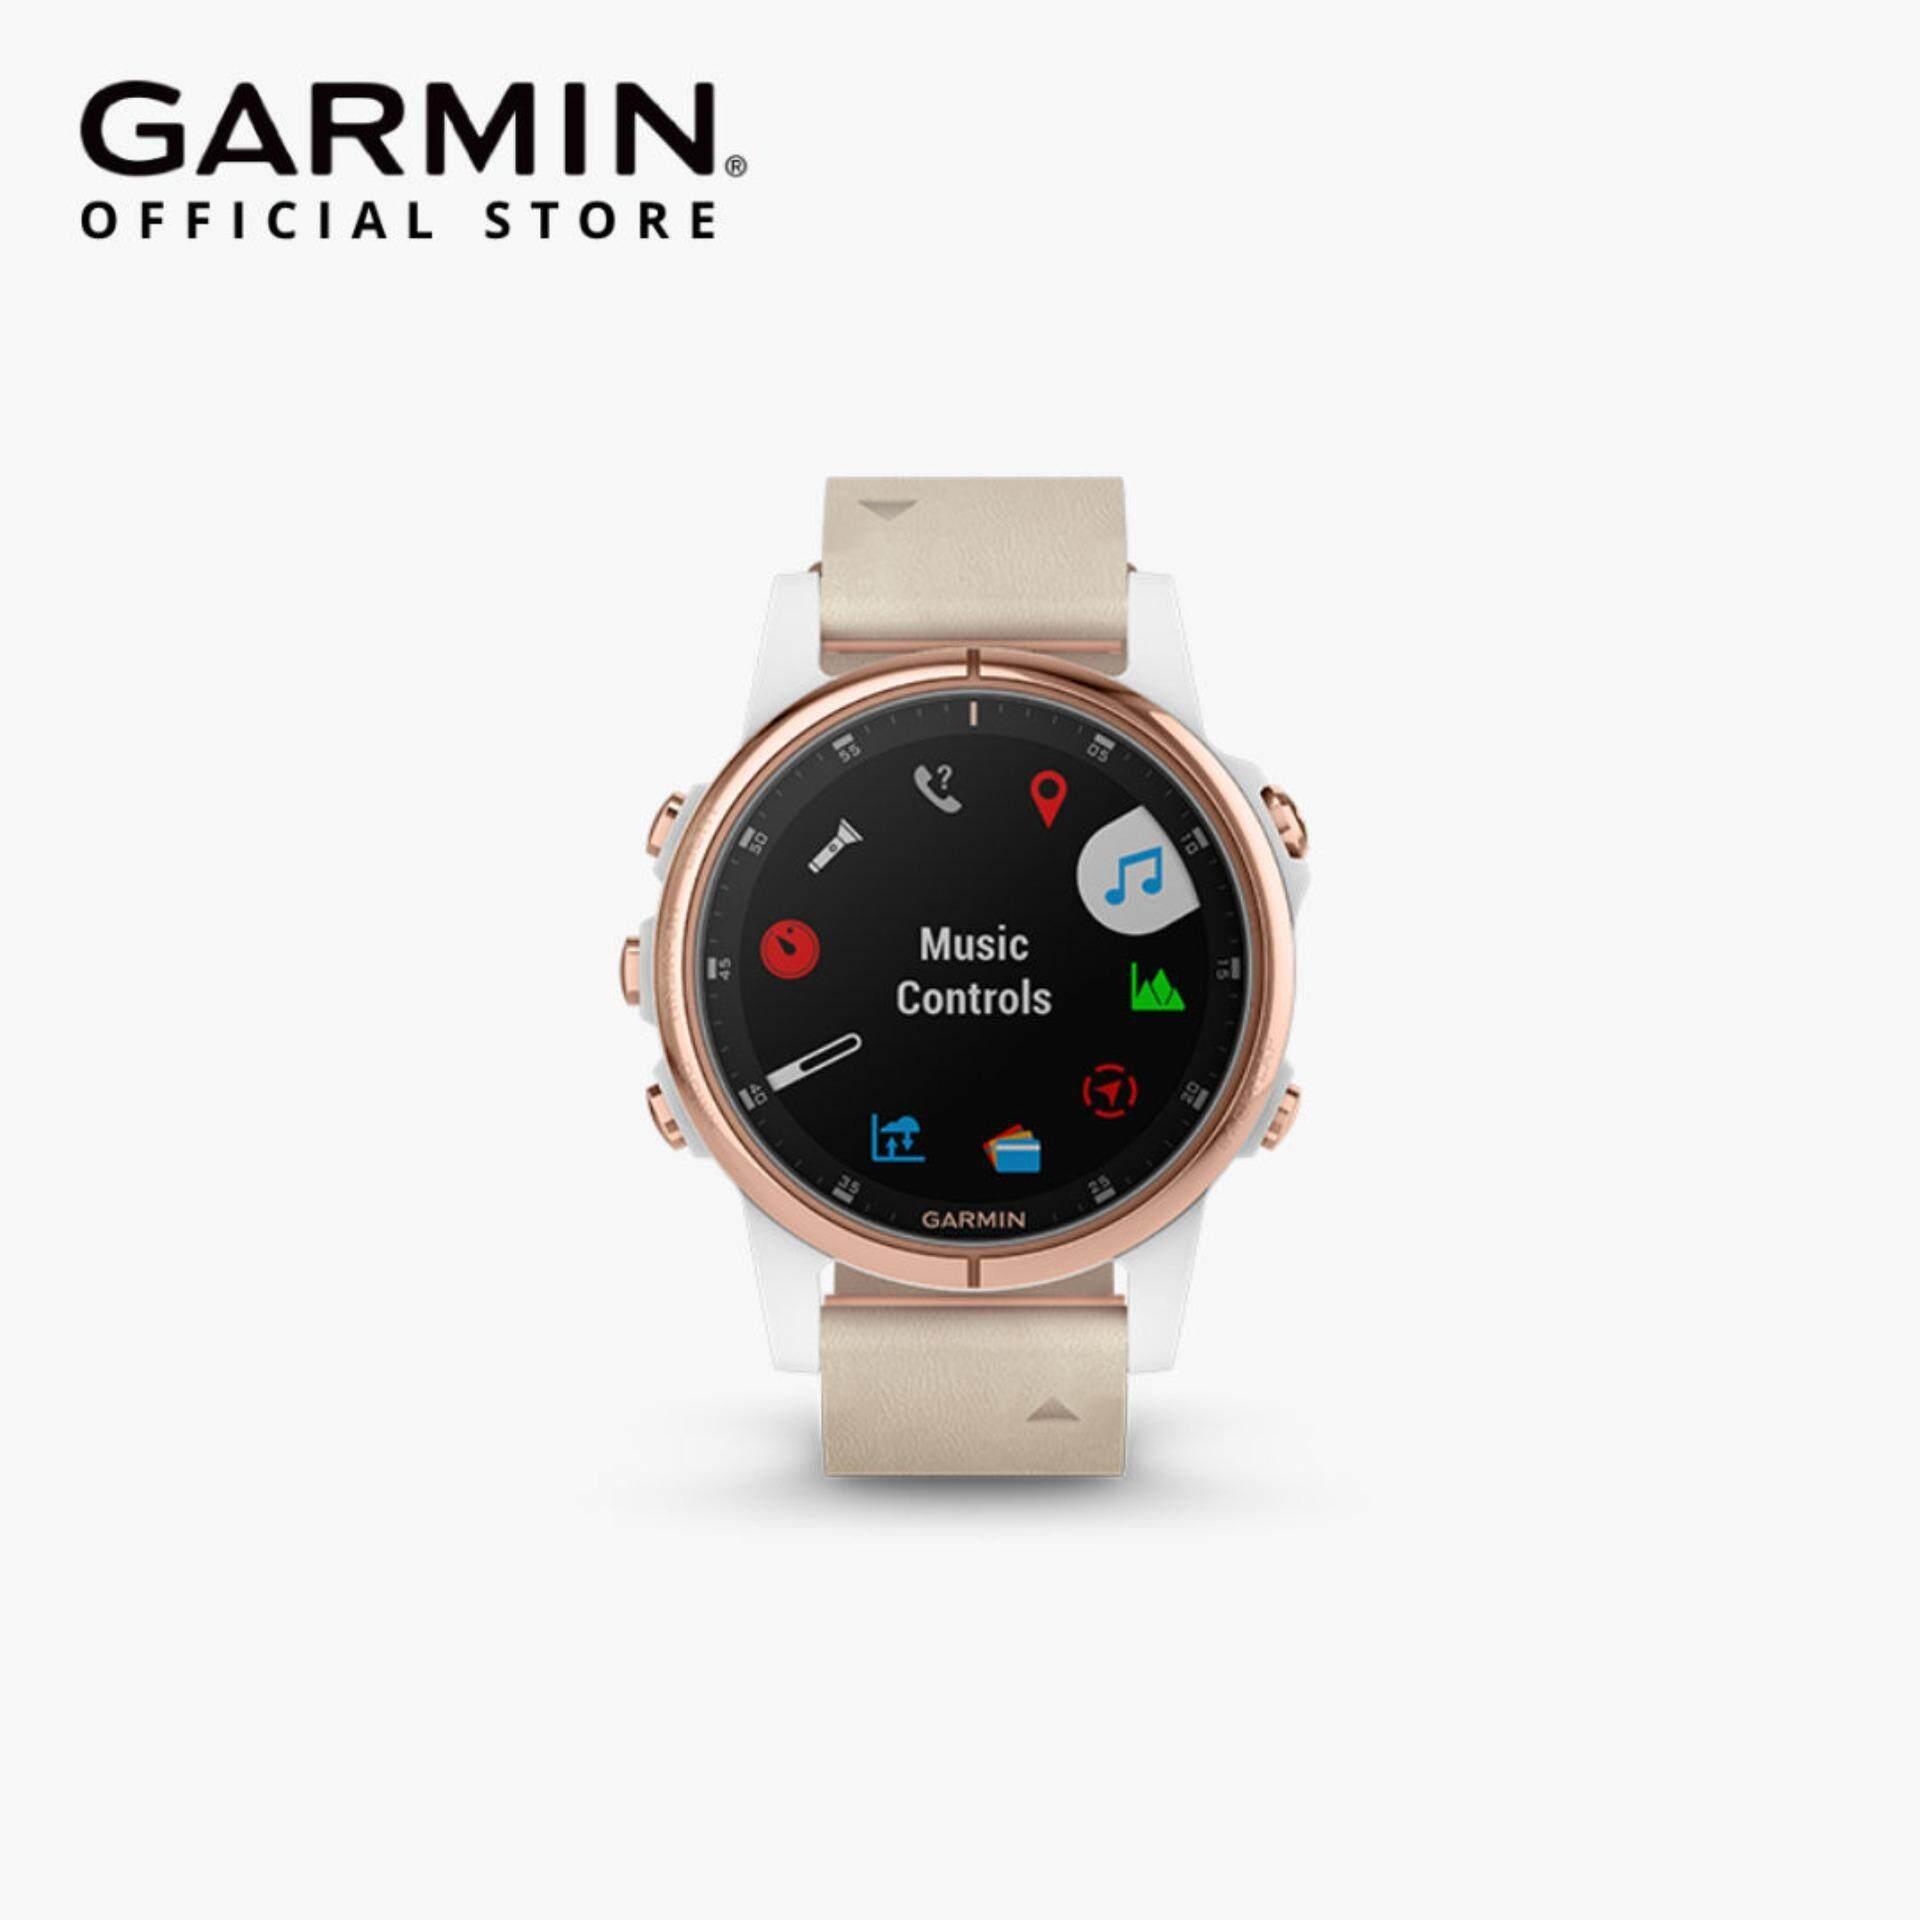 GARMIN FENIX 5S PLUS SAPPHIRE MULTISPORT GPS SMARTWATCH - ROSE GOLD/BLACK